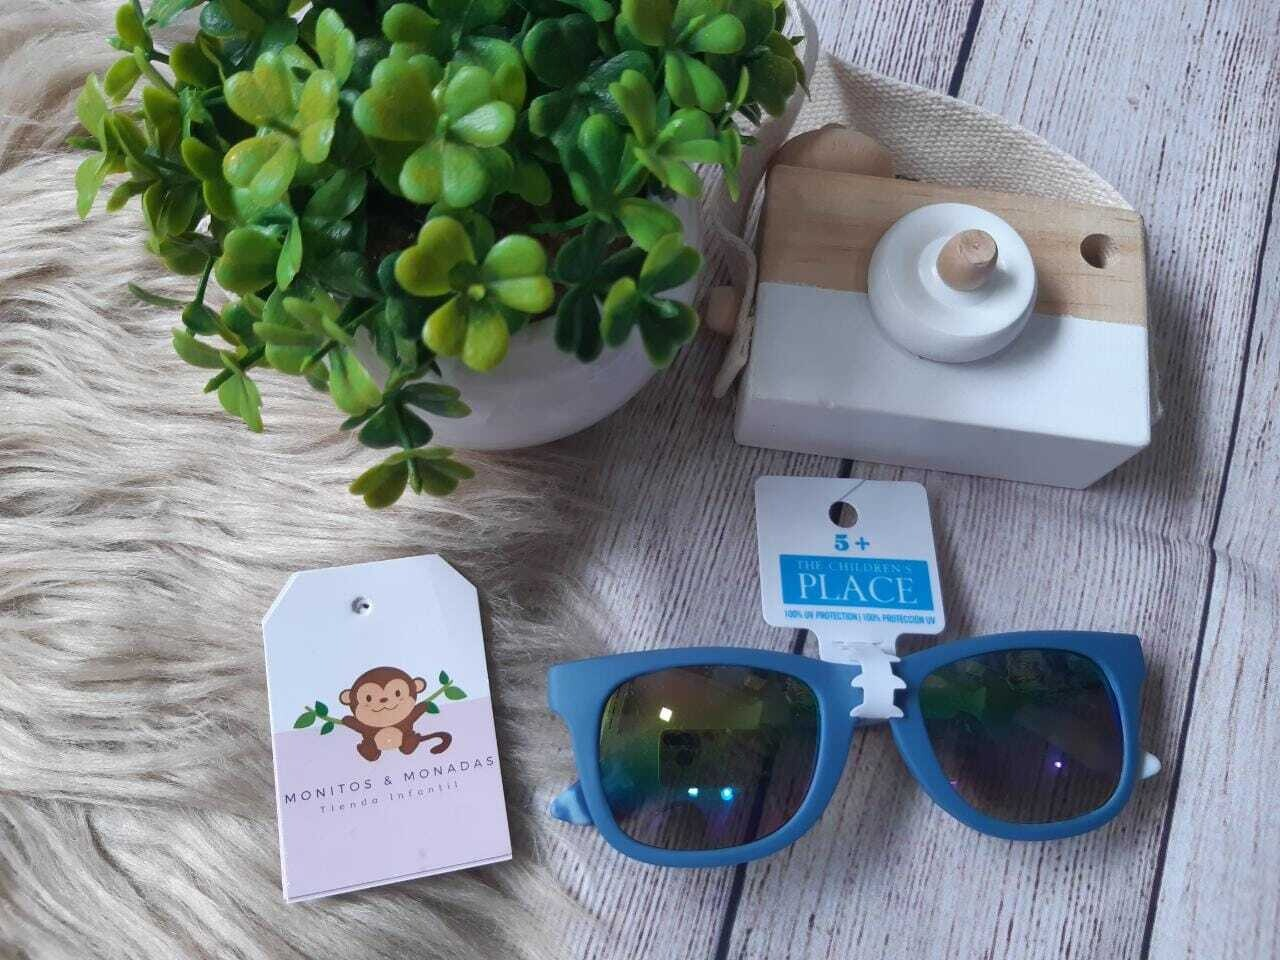 Gafas azules de niños, Talla 5+